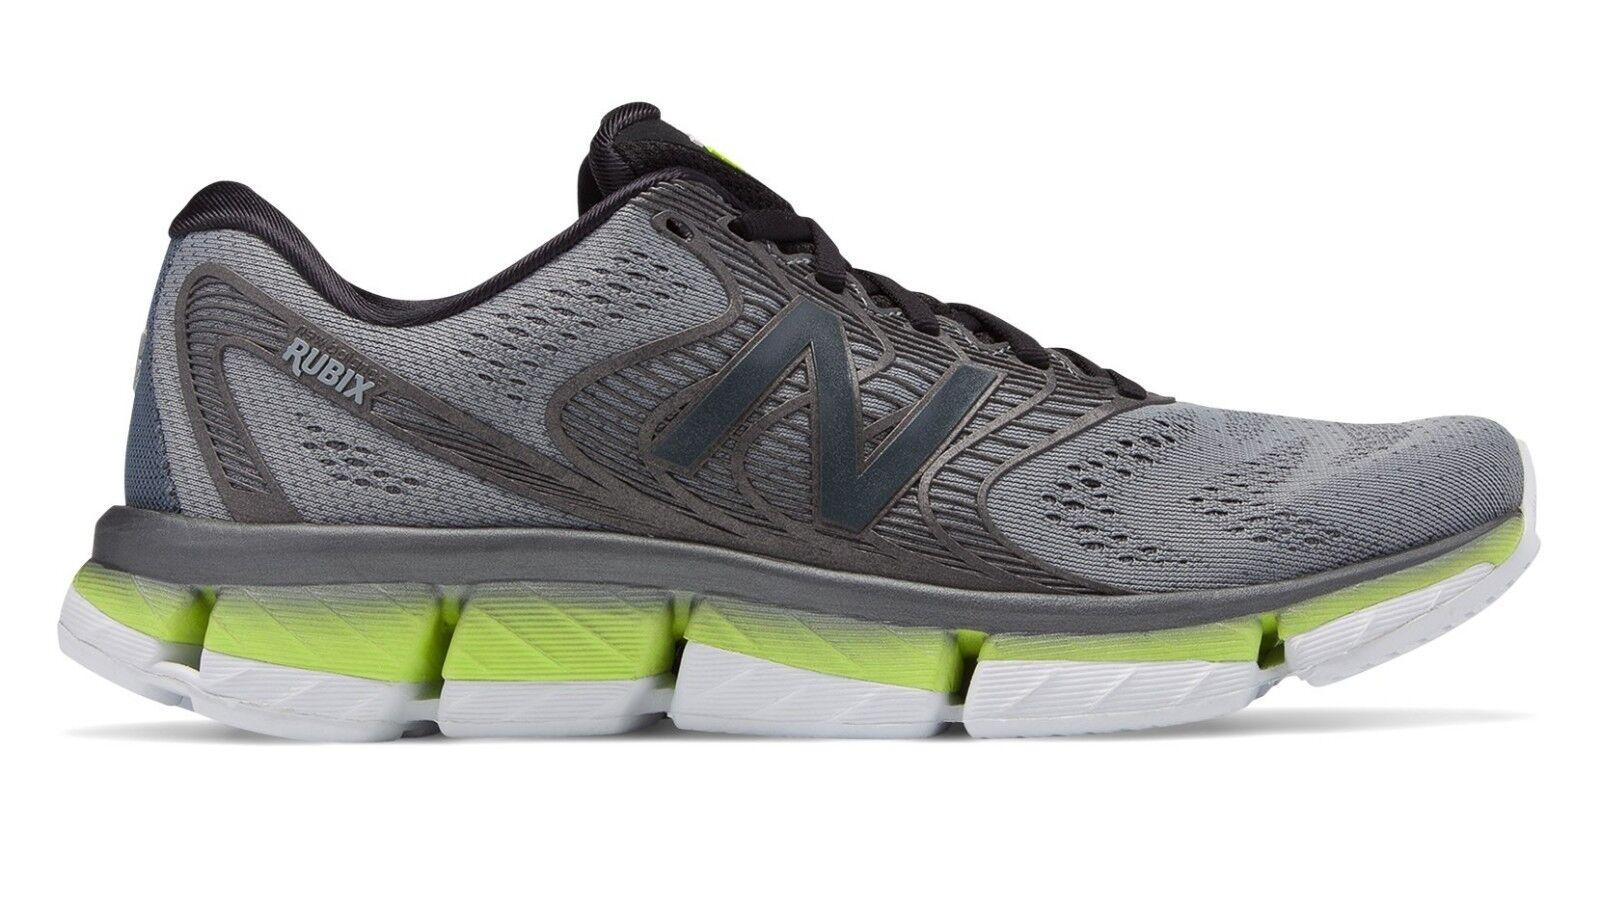 New Balance MRUBXGY Men's Rubix Silver Yellow Stability Midsole Running Running Running shoes 8889bd